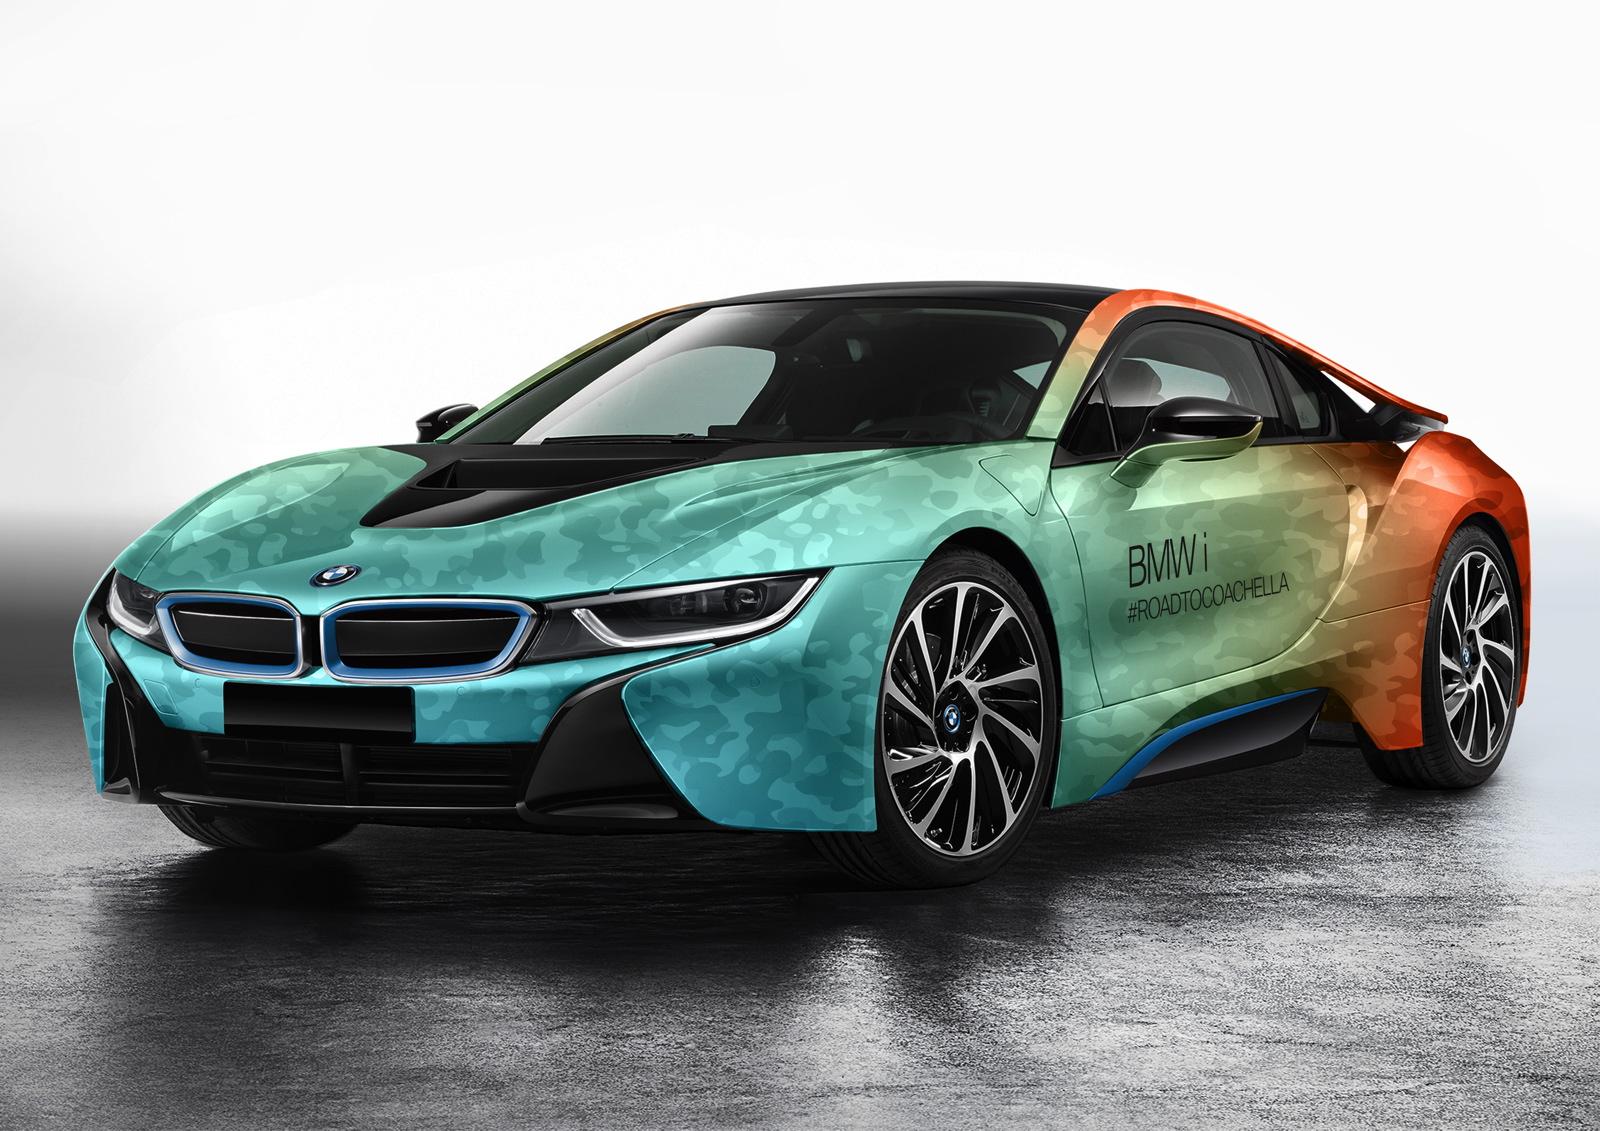 BMW i Coachella 10